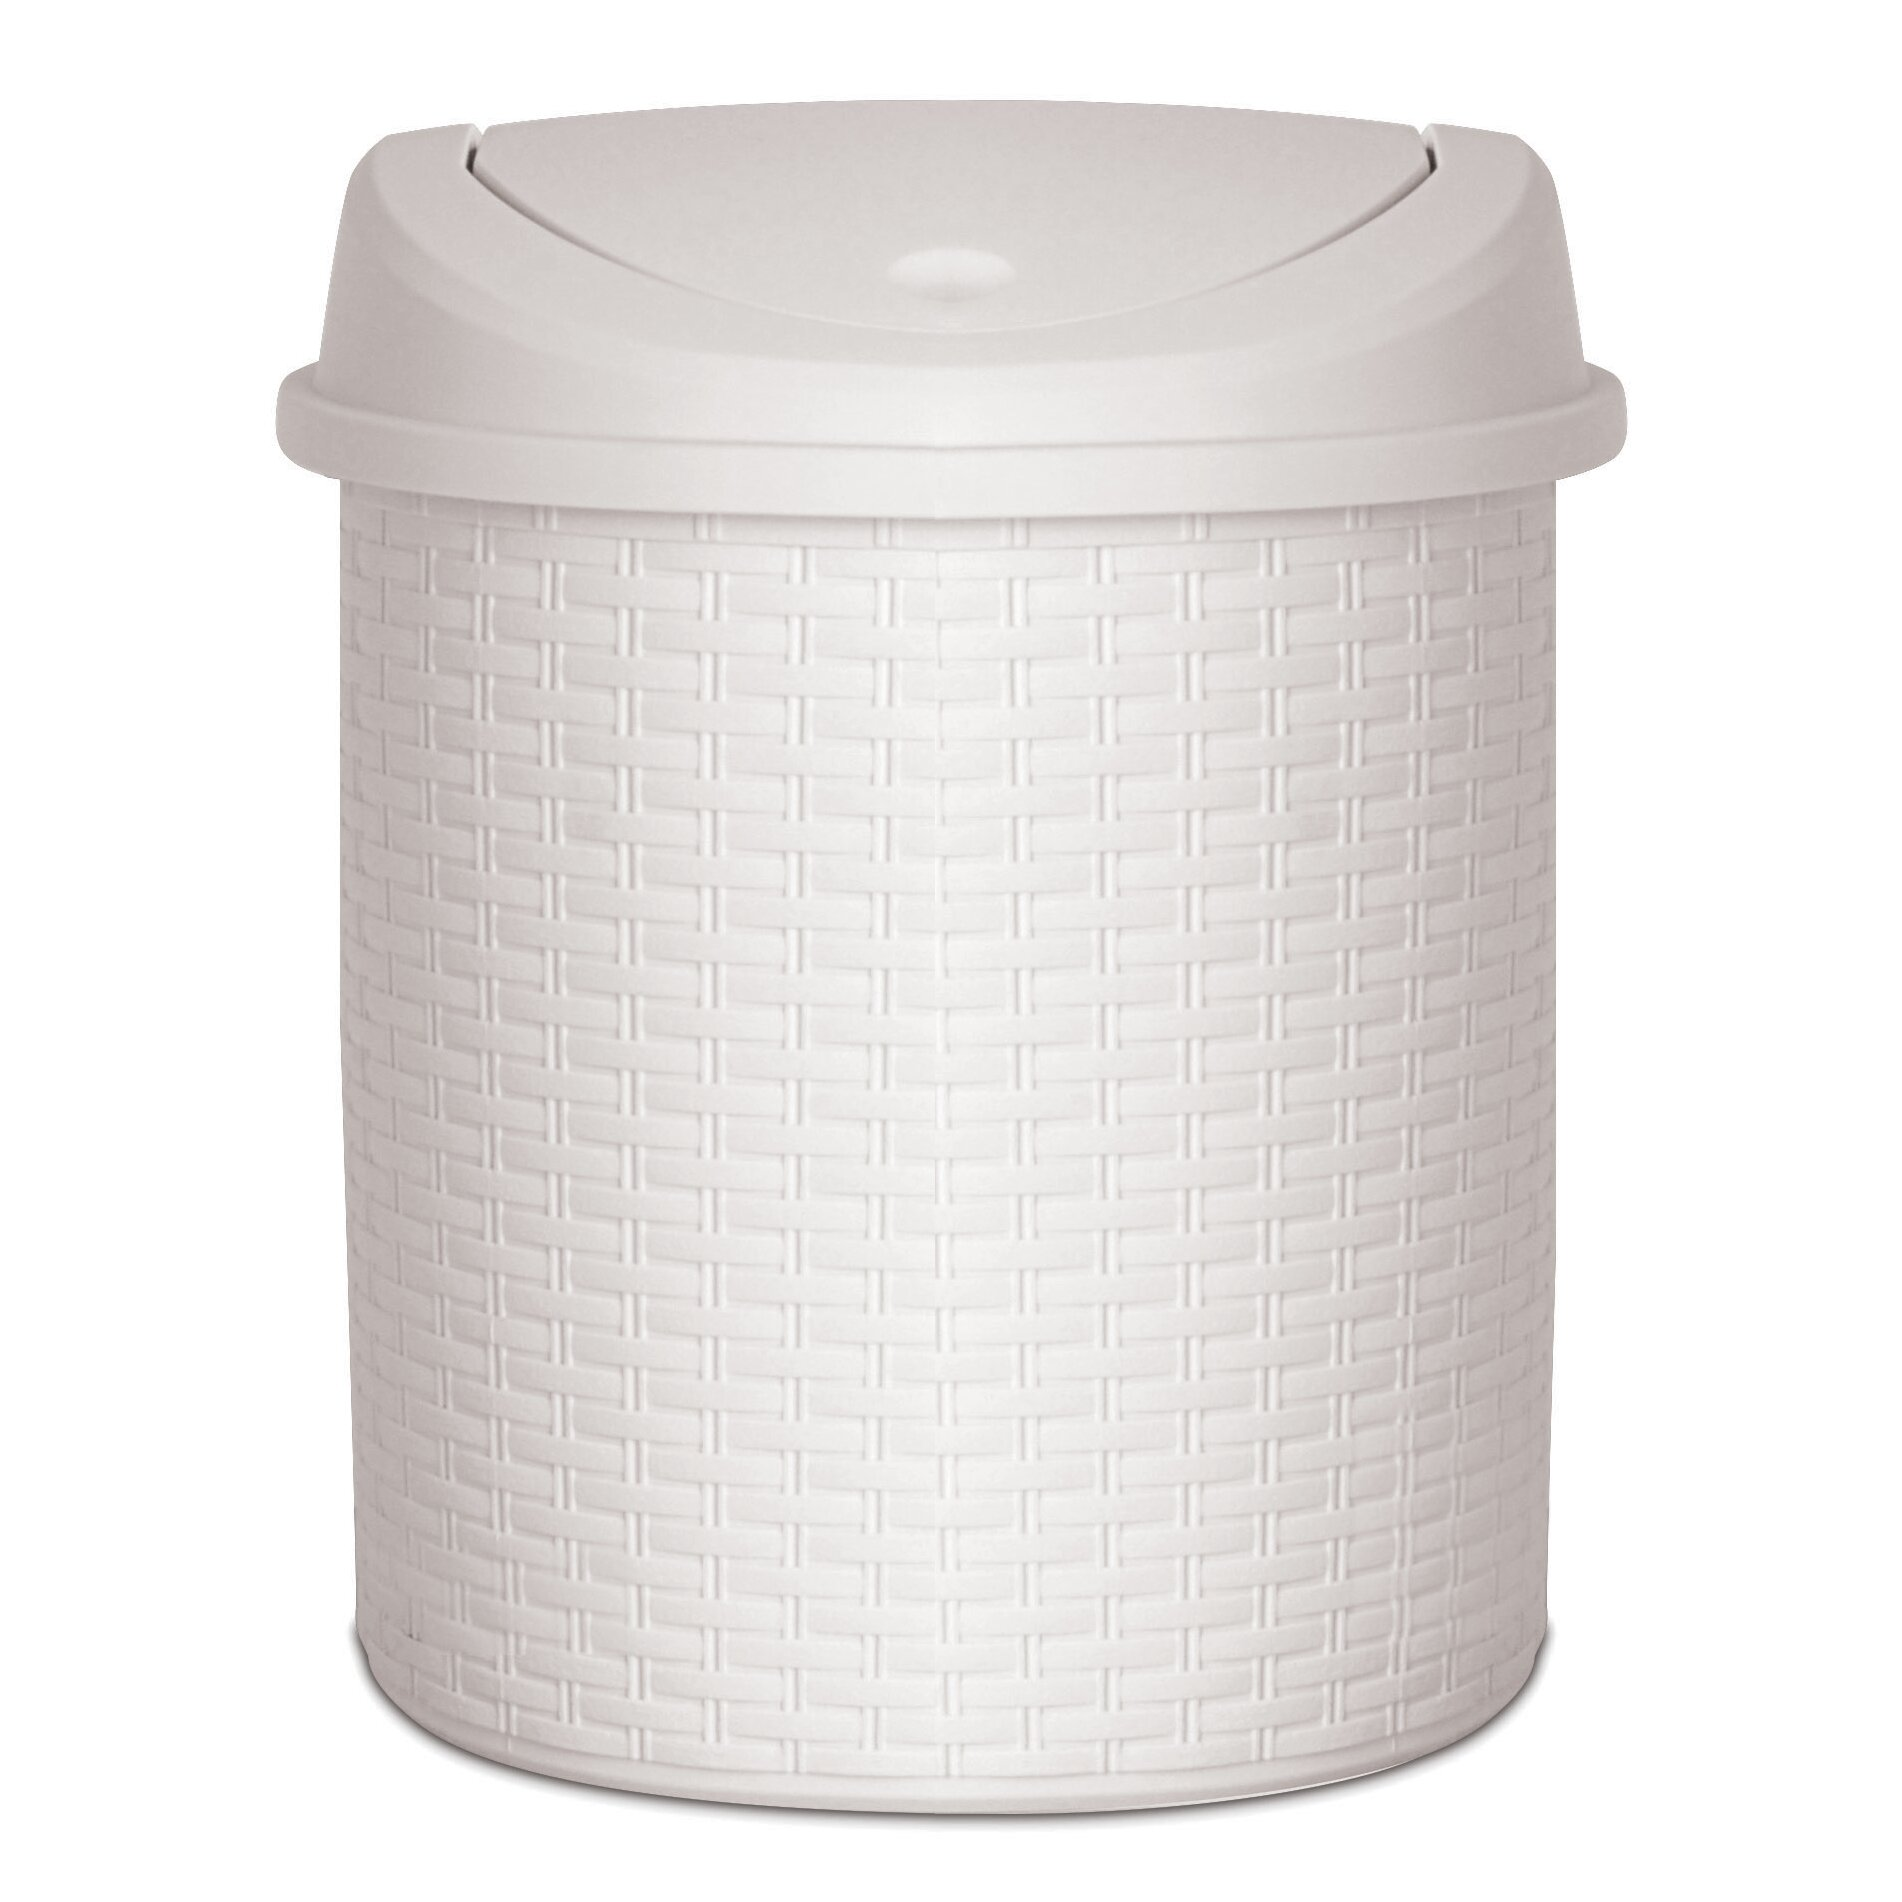 superior performance 5 5 gallon swing top plastic trash can reviews wayfair. Black Bedroom Furniture Sets. Home Design Ideas